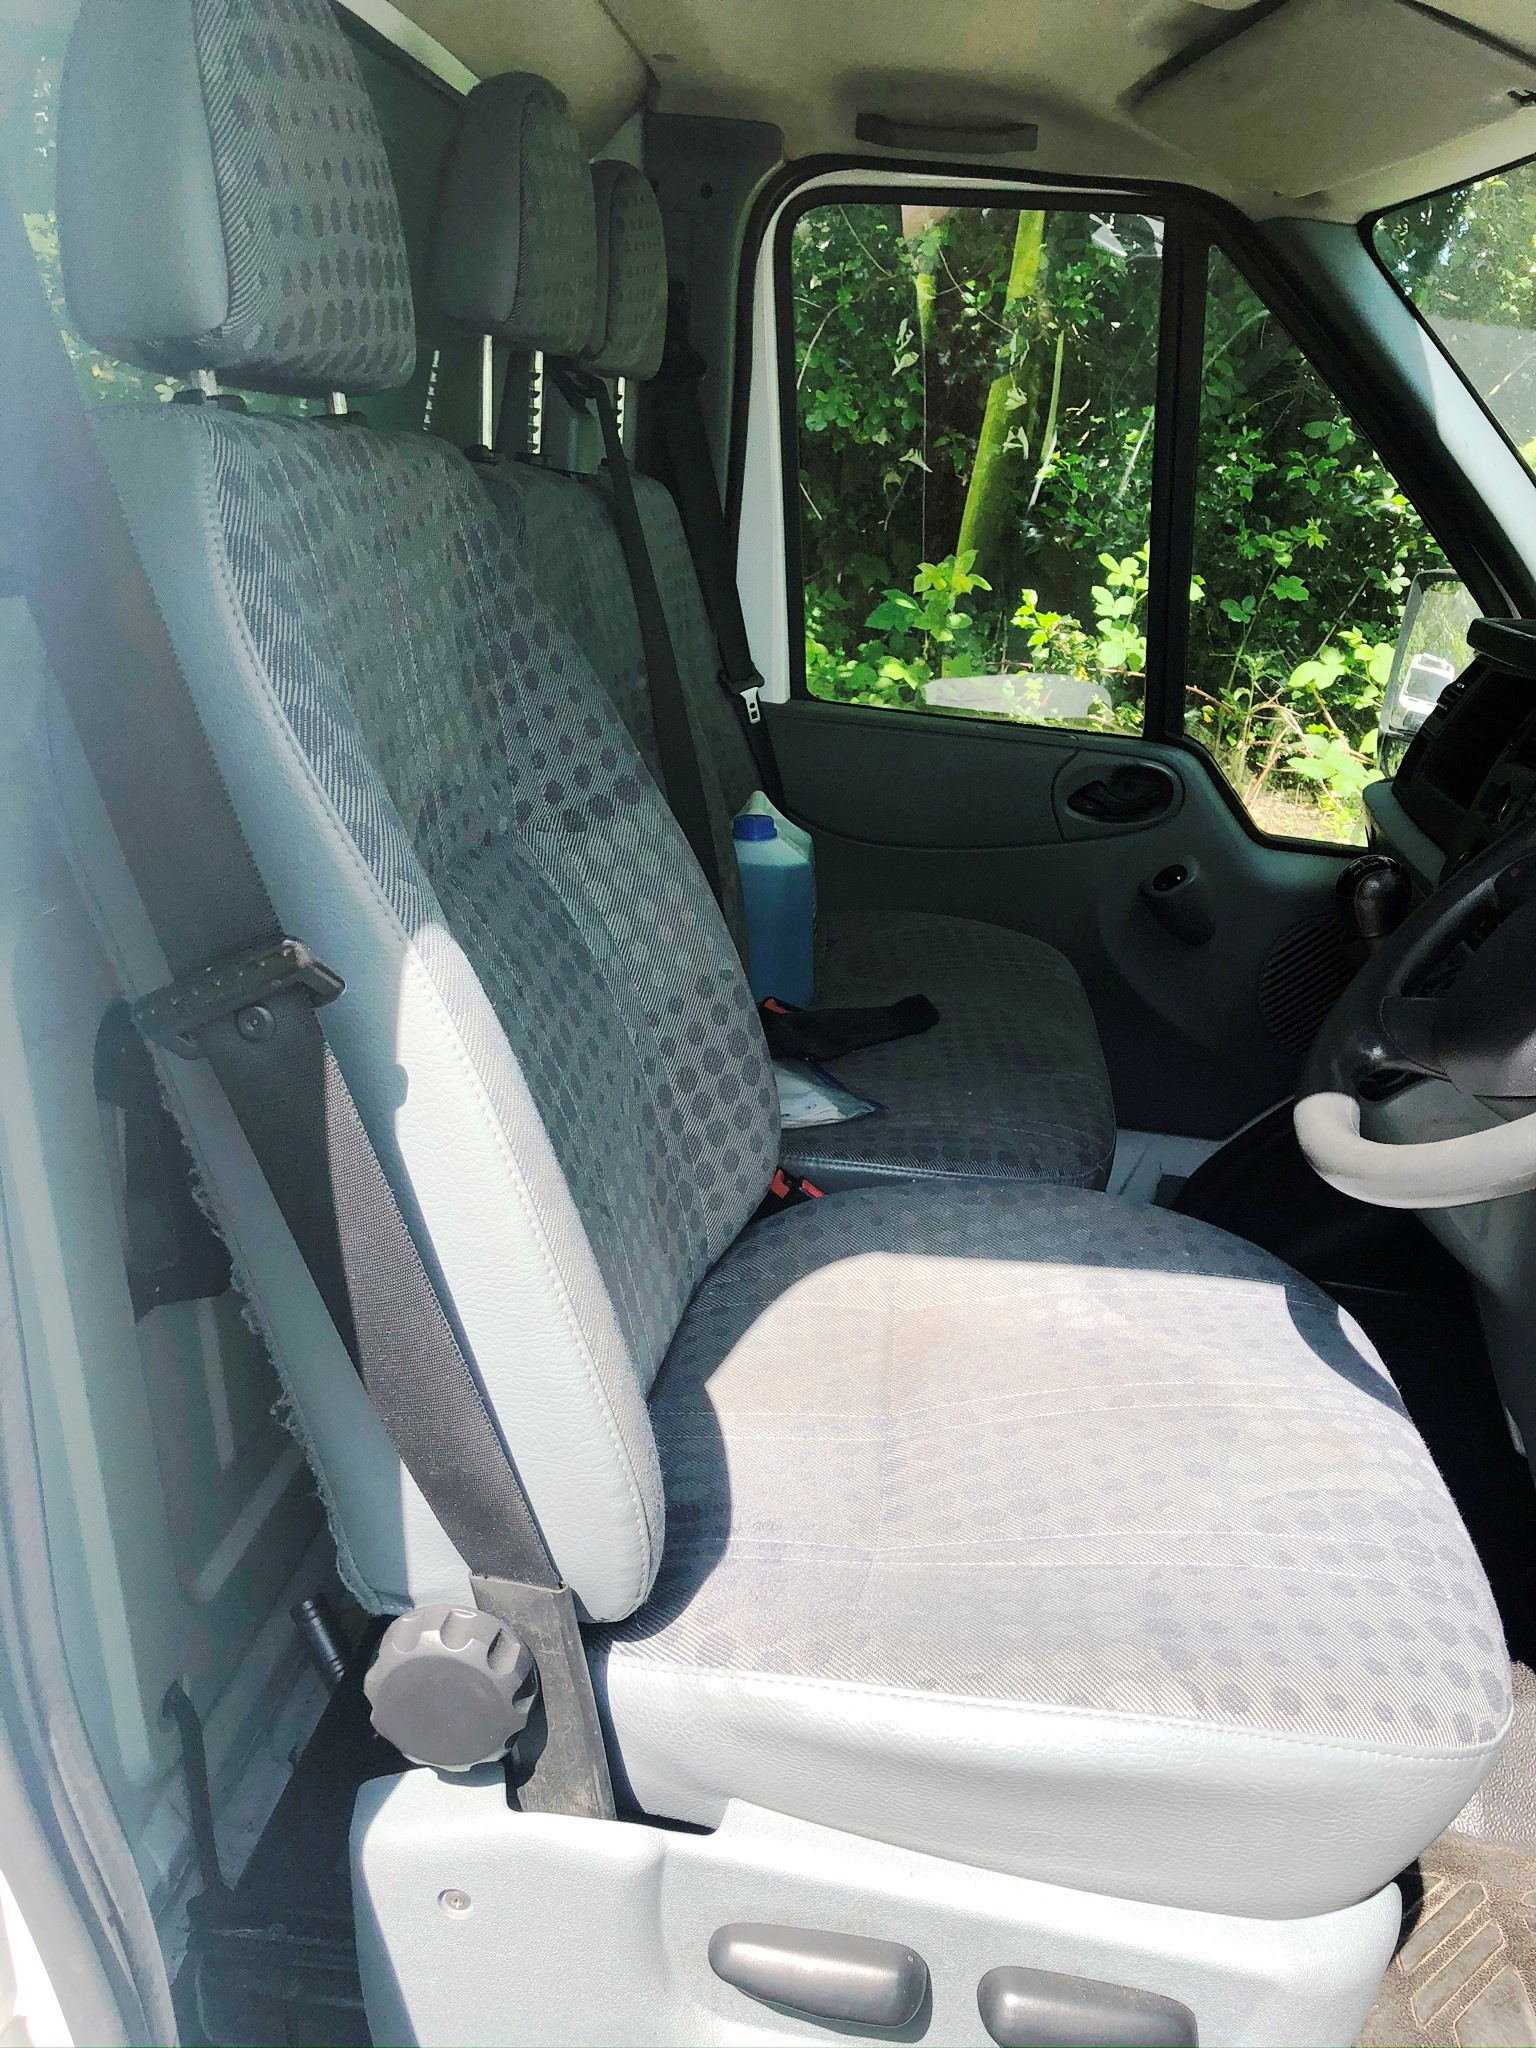 White Ford Transit 155 T350 RWD 3.5T w/ Tail Lift | Reg: CV13 TVM | Mileage: 91,513 - Image 4 of 8